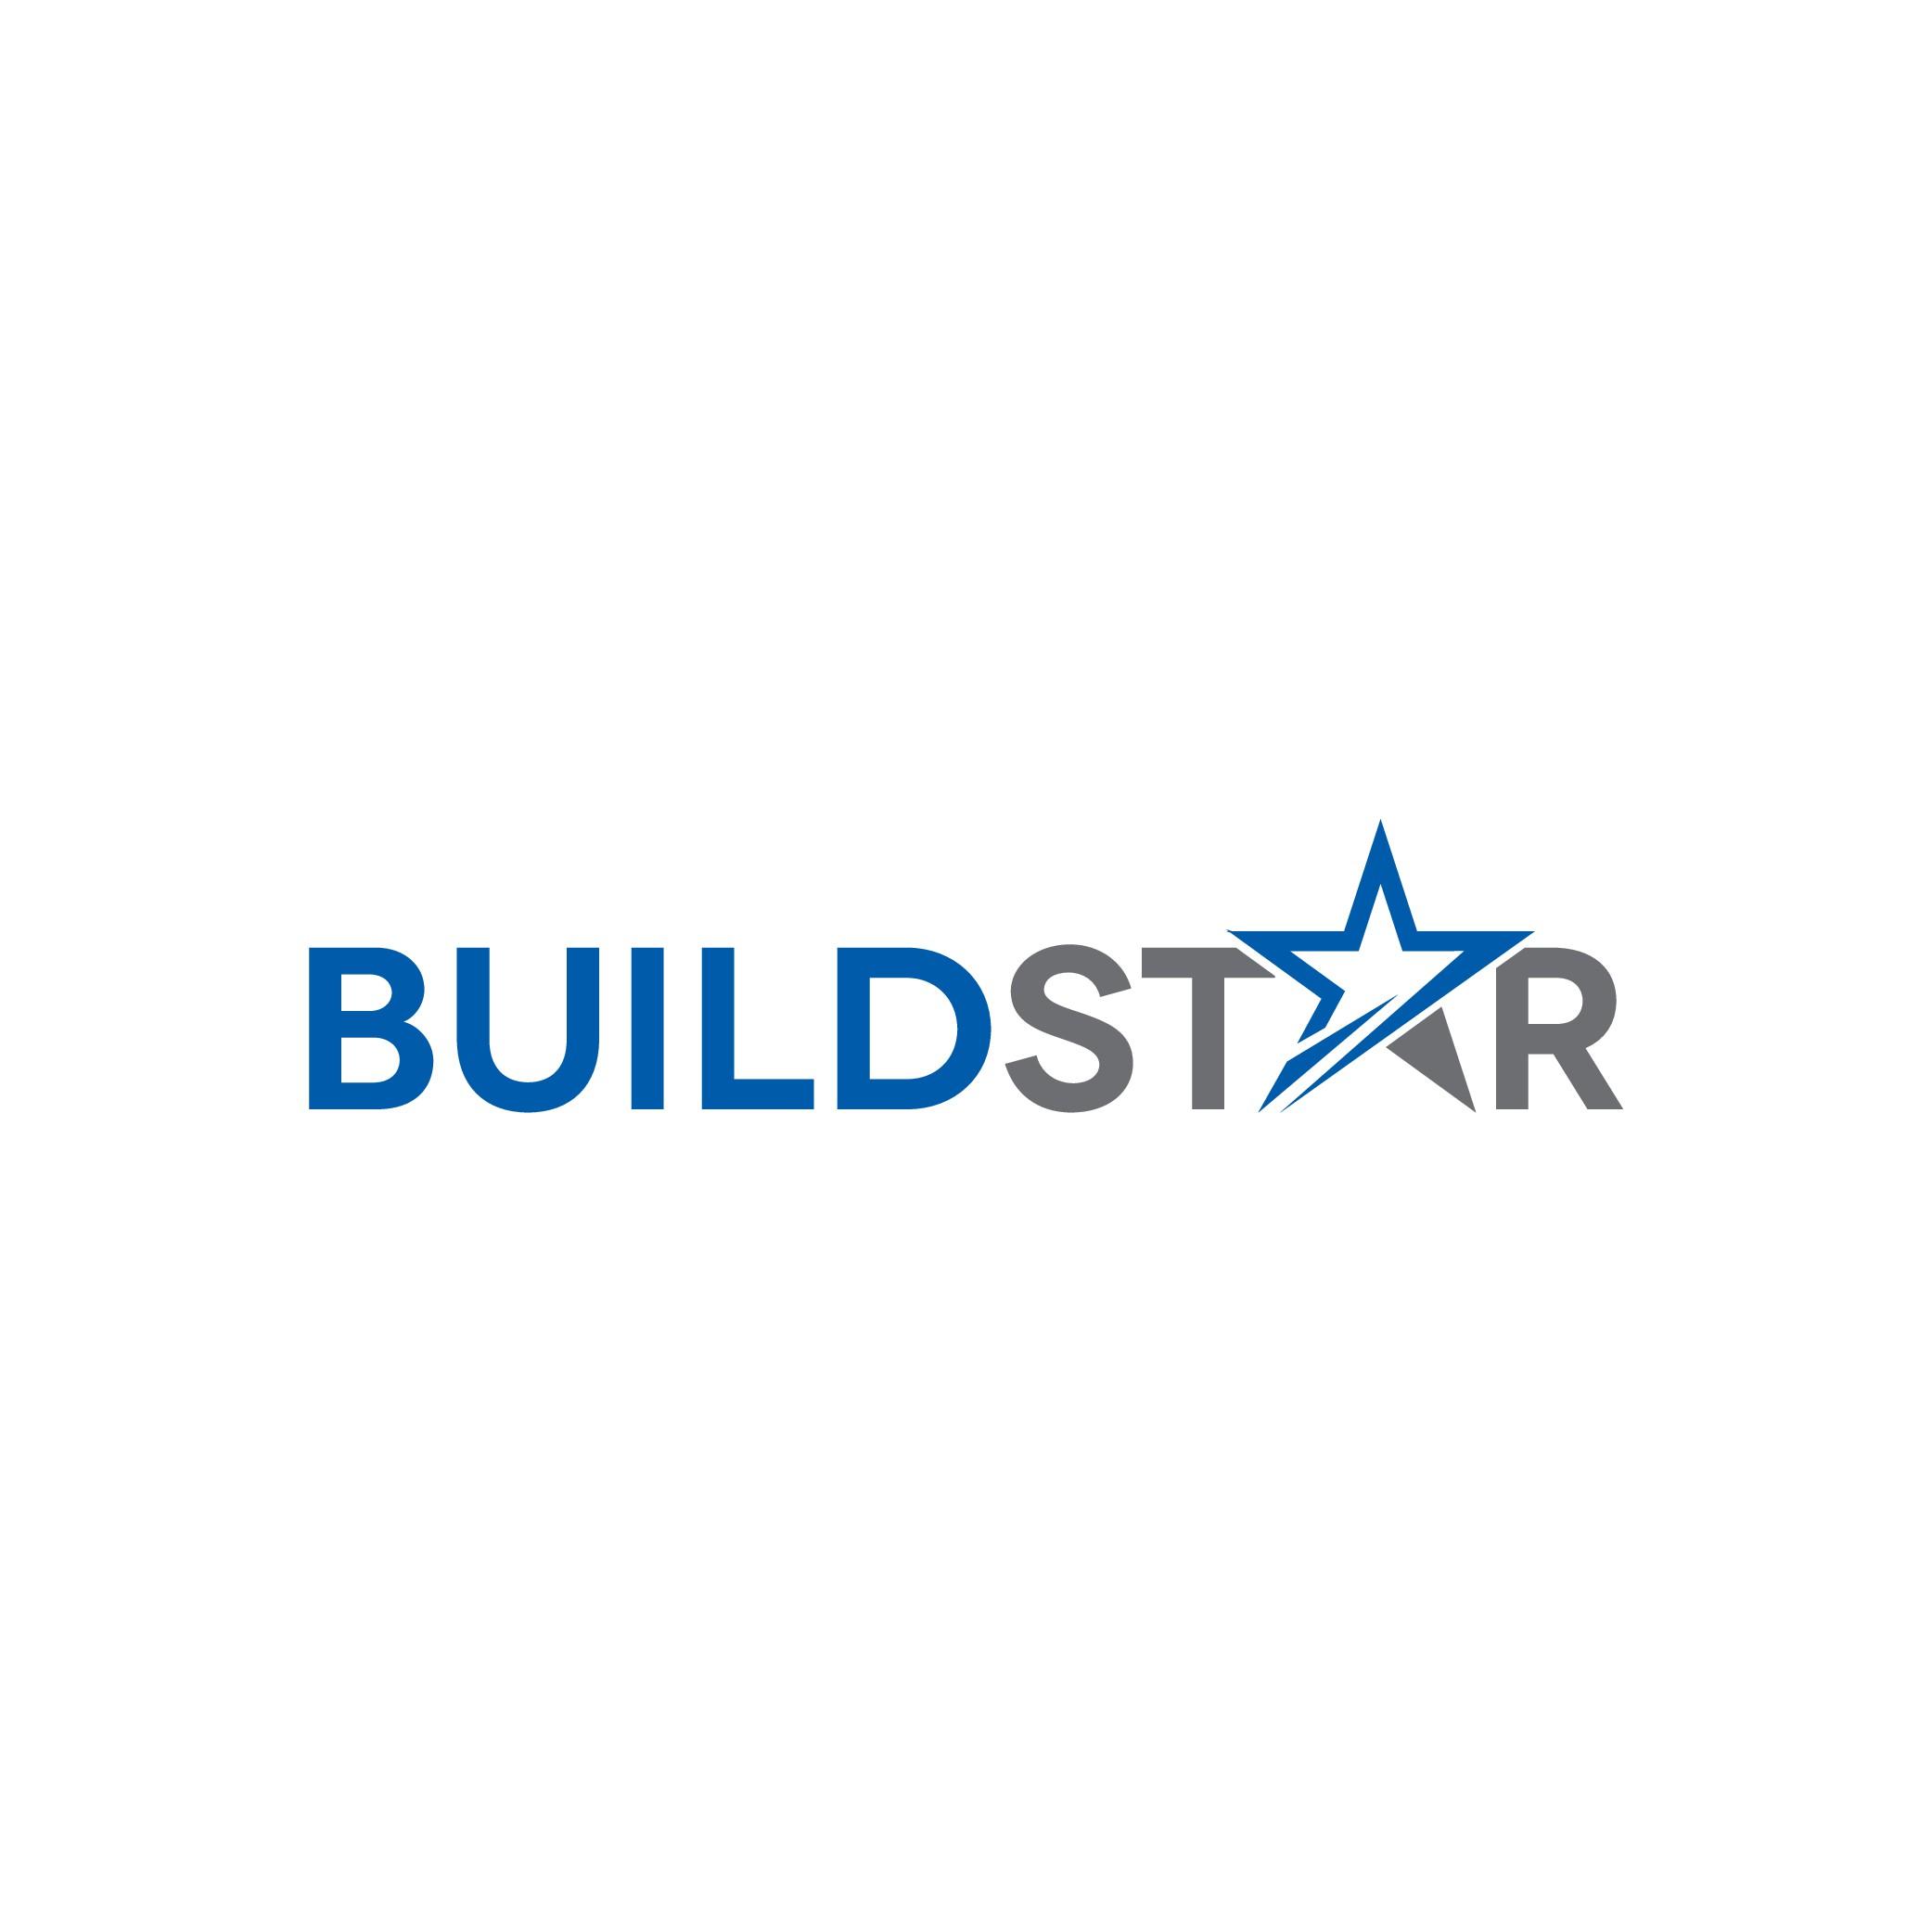 BuildStar Logo - Renew and Refresh!